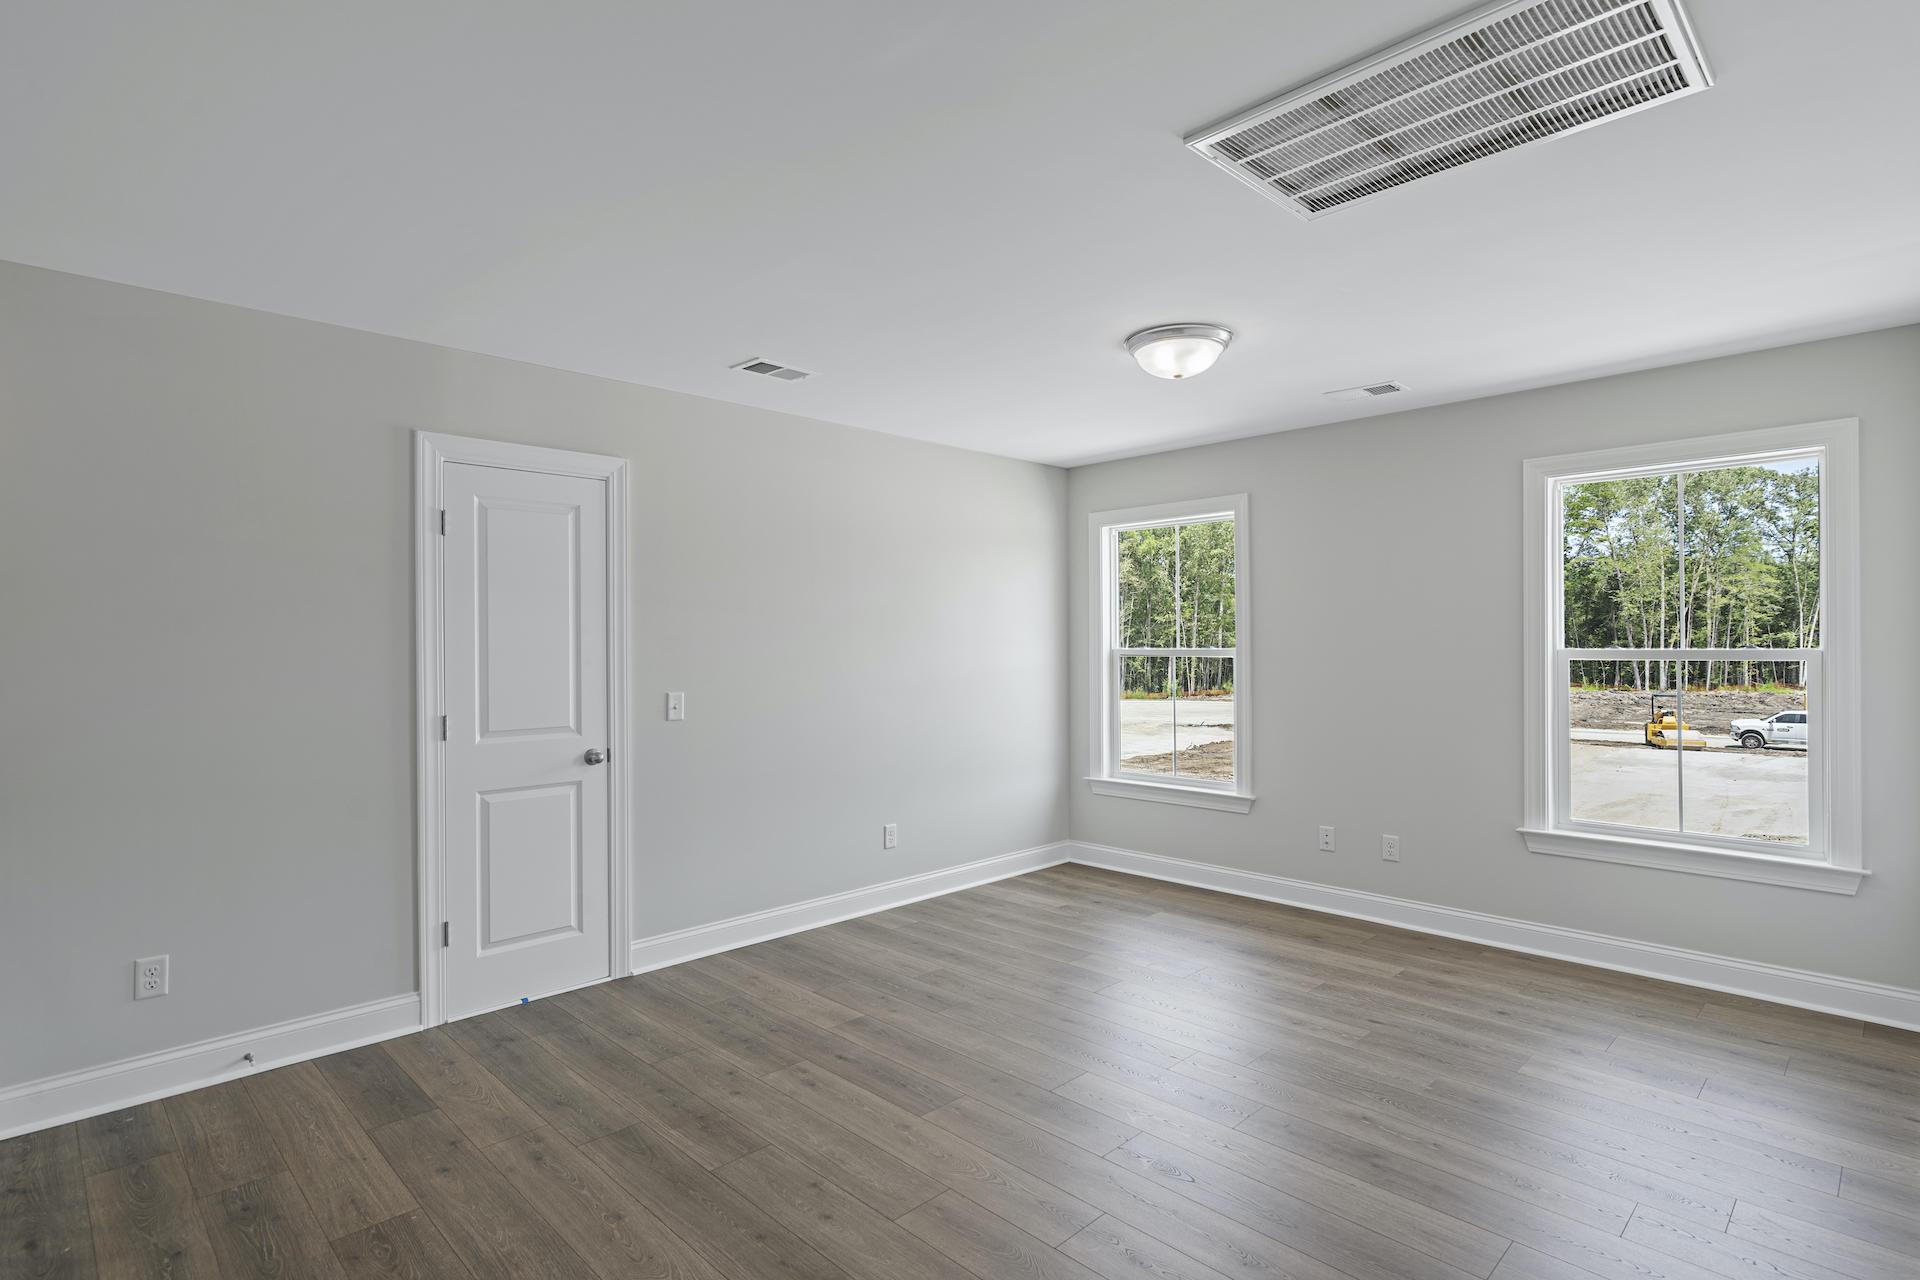 Drayton Oaks Homes For Sale - 105 Plowden Mill, Summerville, SC - 1